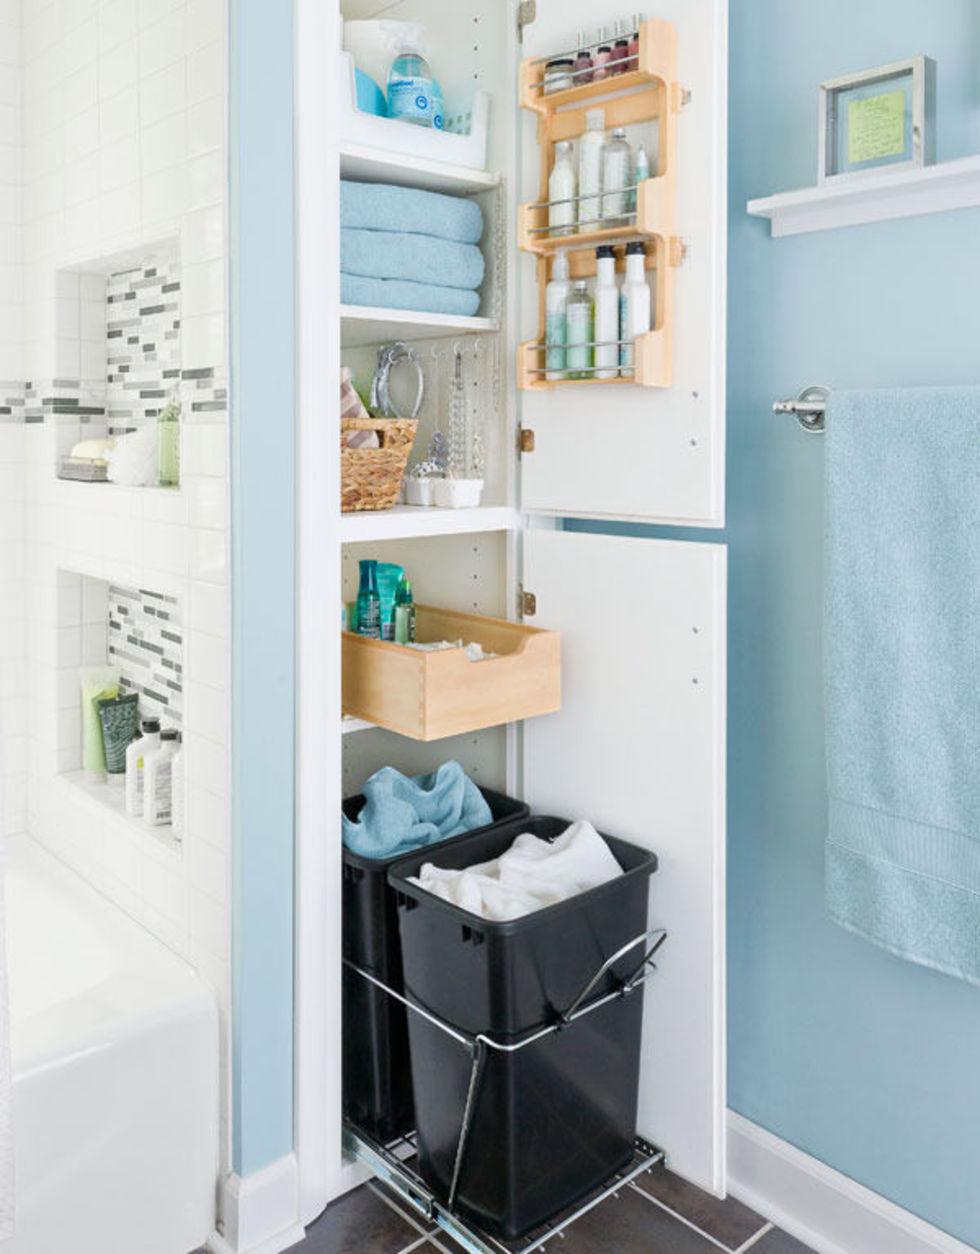 24. Maximizing Closet Space